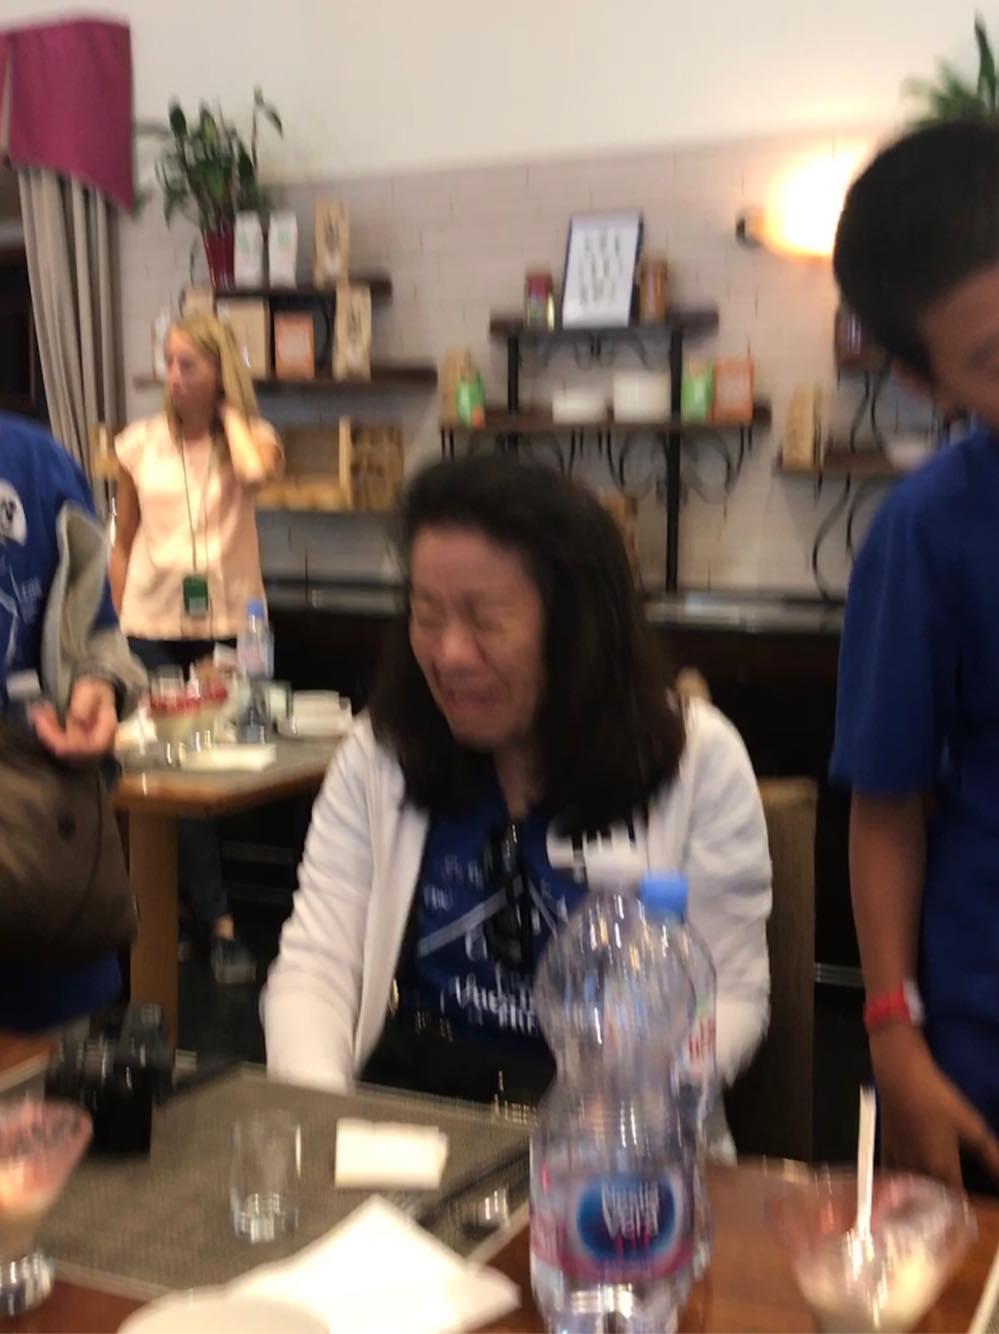 Blurry because Marisa was laughing so hard